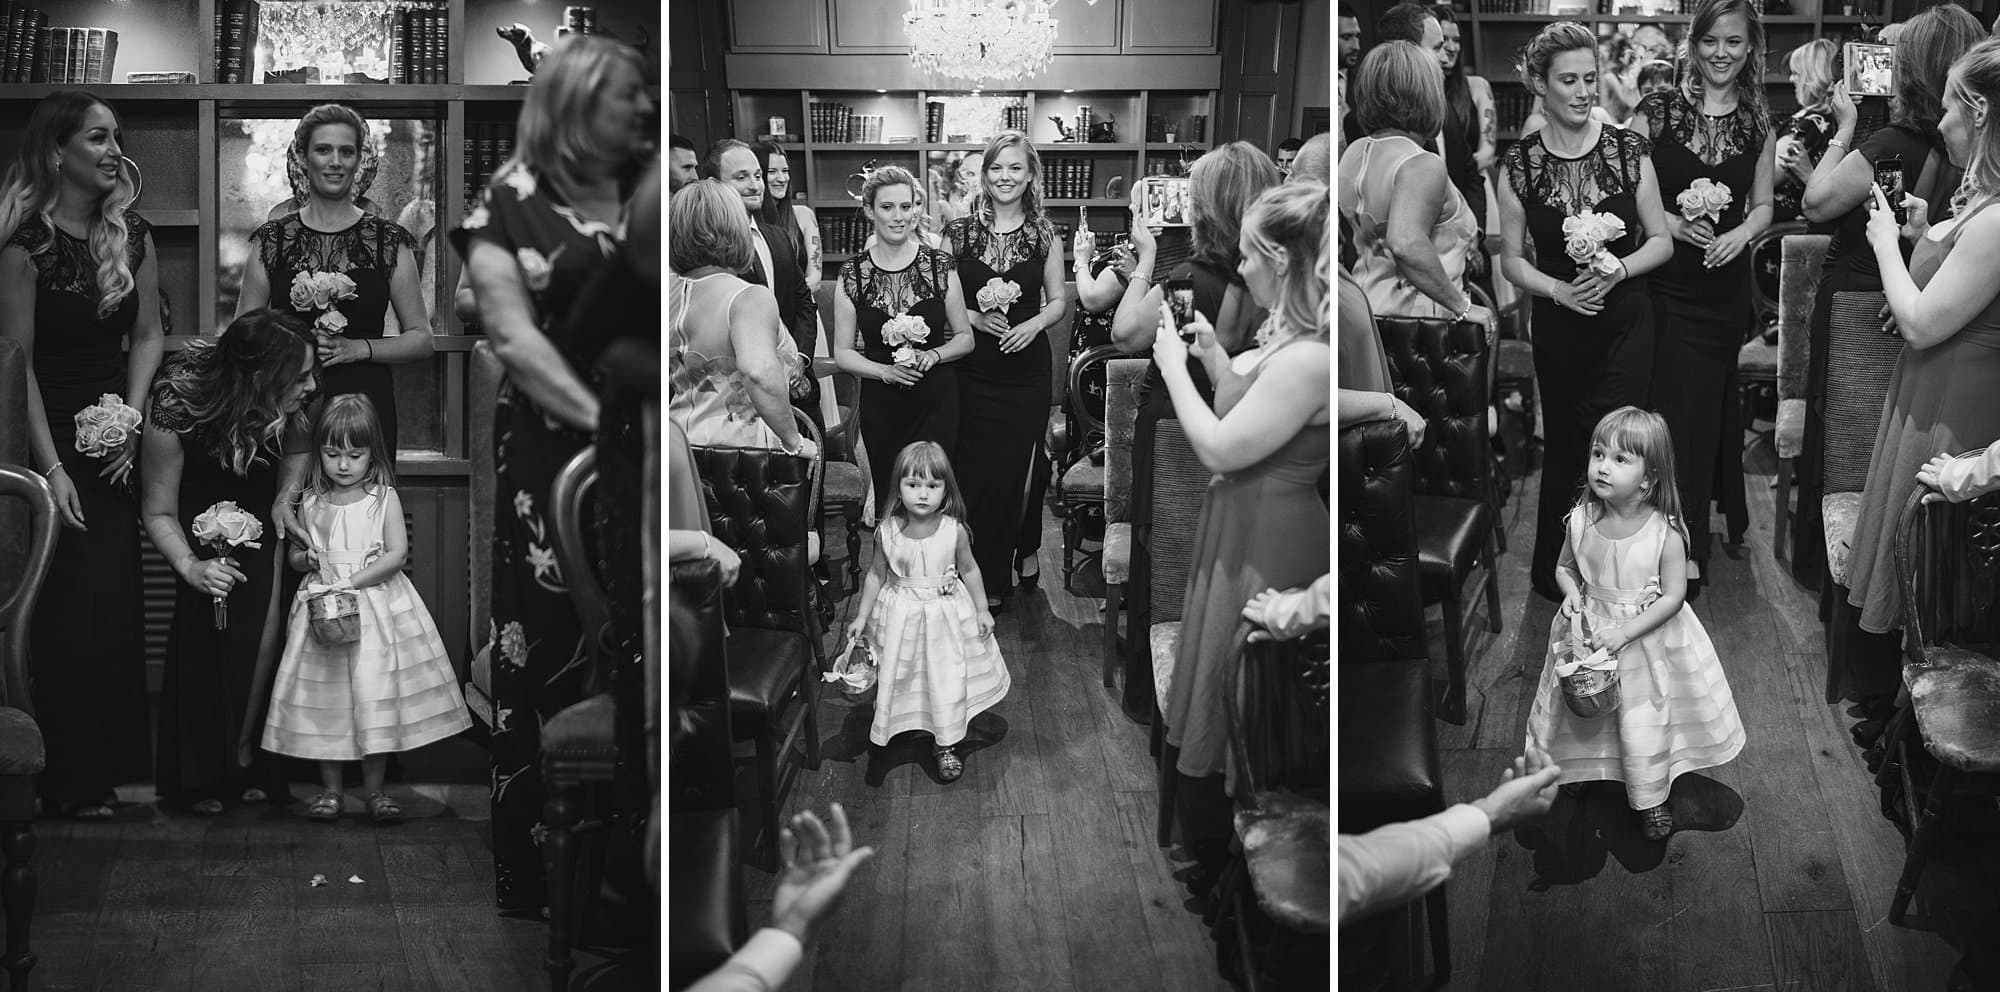 london pub wedding photographer jn 009 - The County Arms Wedding Photographer   Jen & Nick